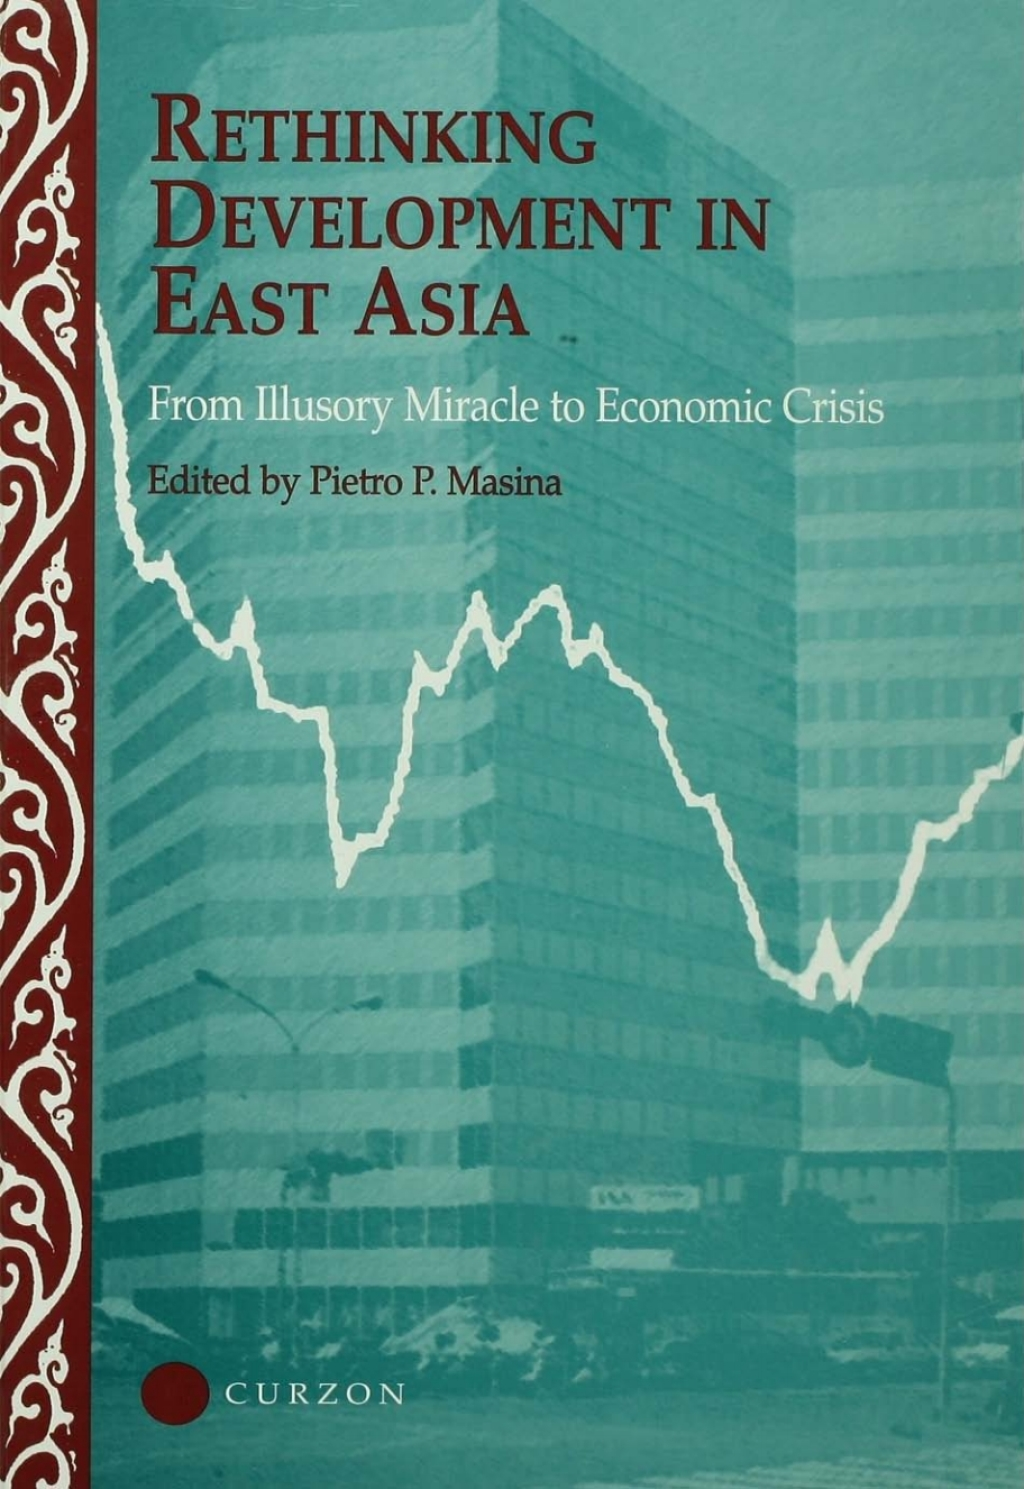 Rethinking Development in East Asia (eBook Rental)